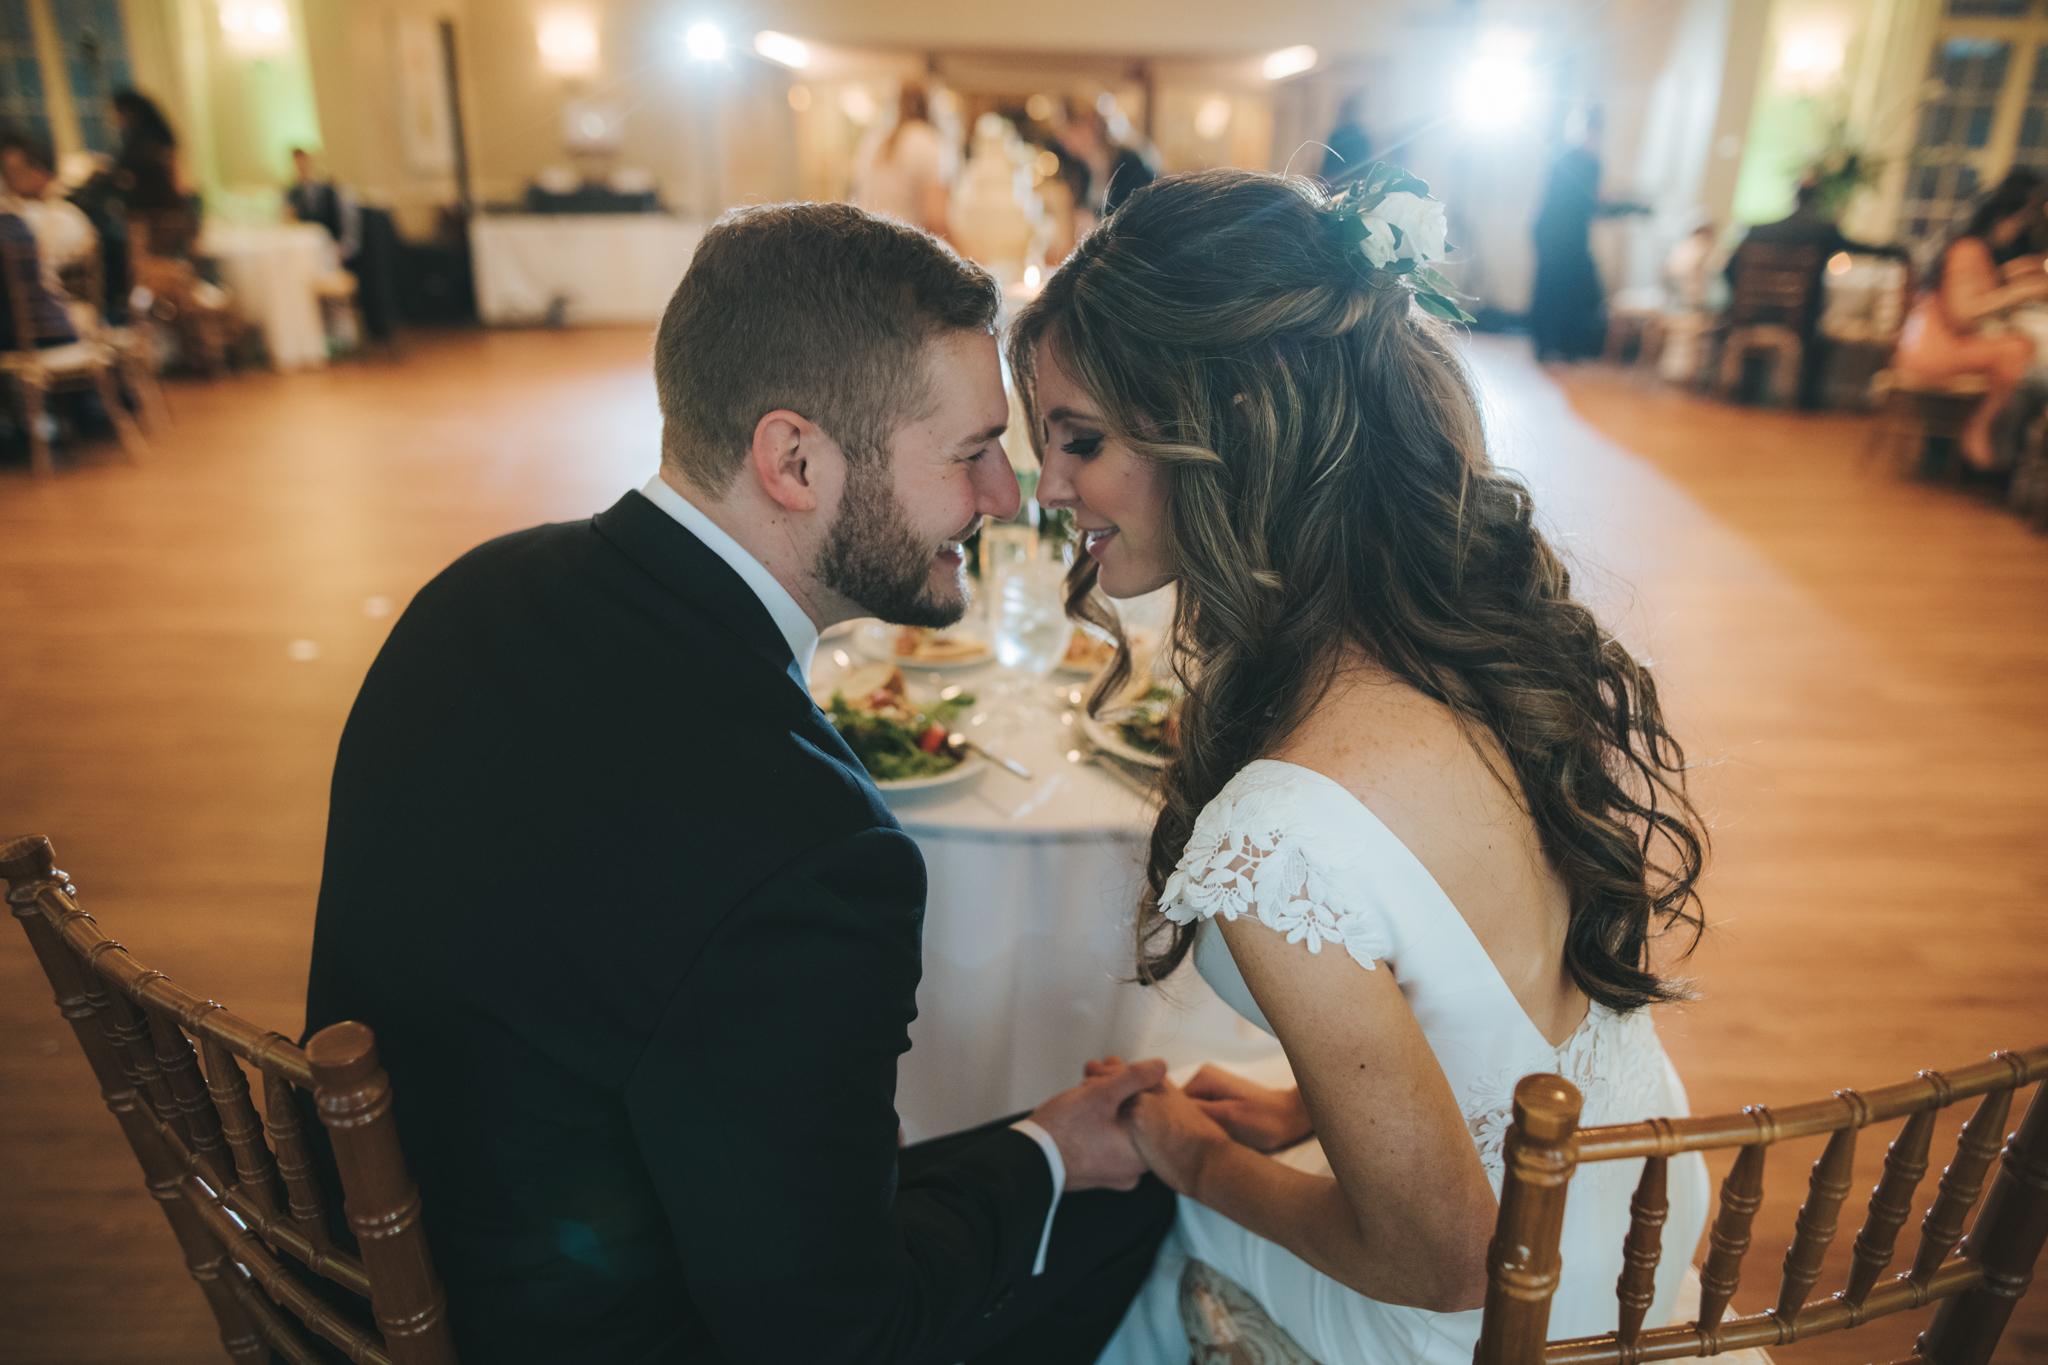 Lauren + Chris - A Glidden House Wedding by Dennis Crider Photography